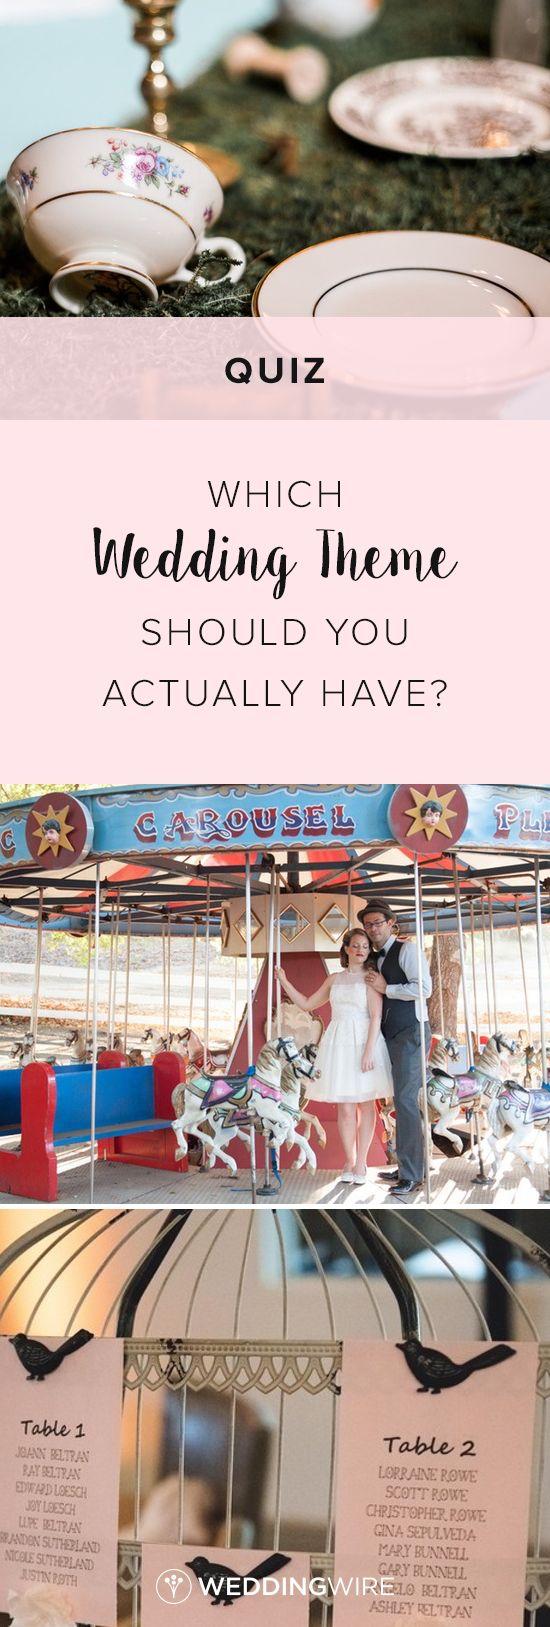 129 best Unique & Themed Wedding Ideas images on Pinterest ...